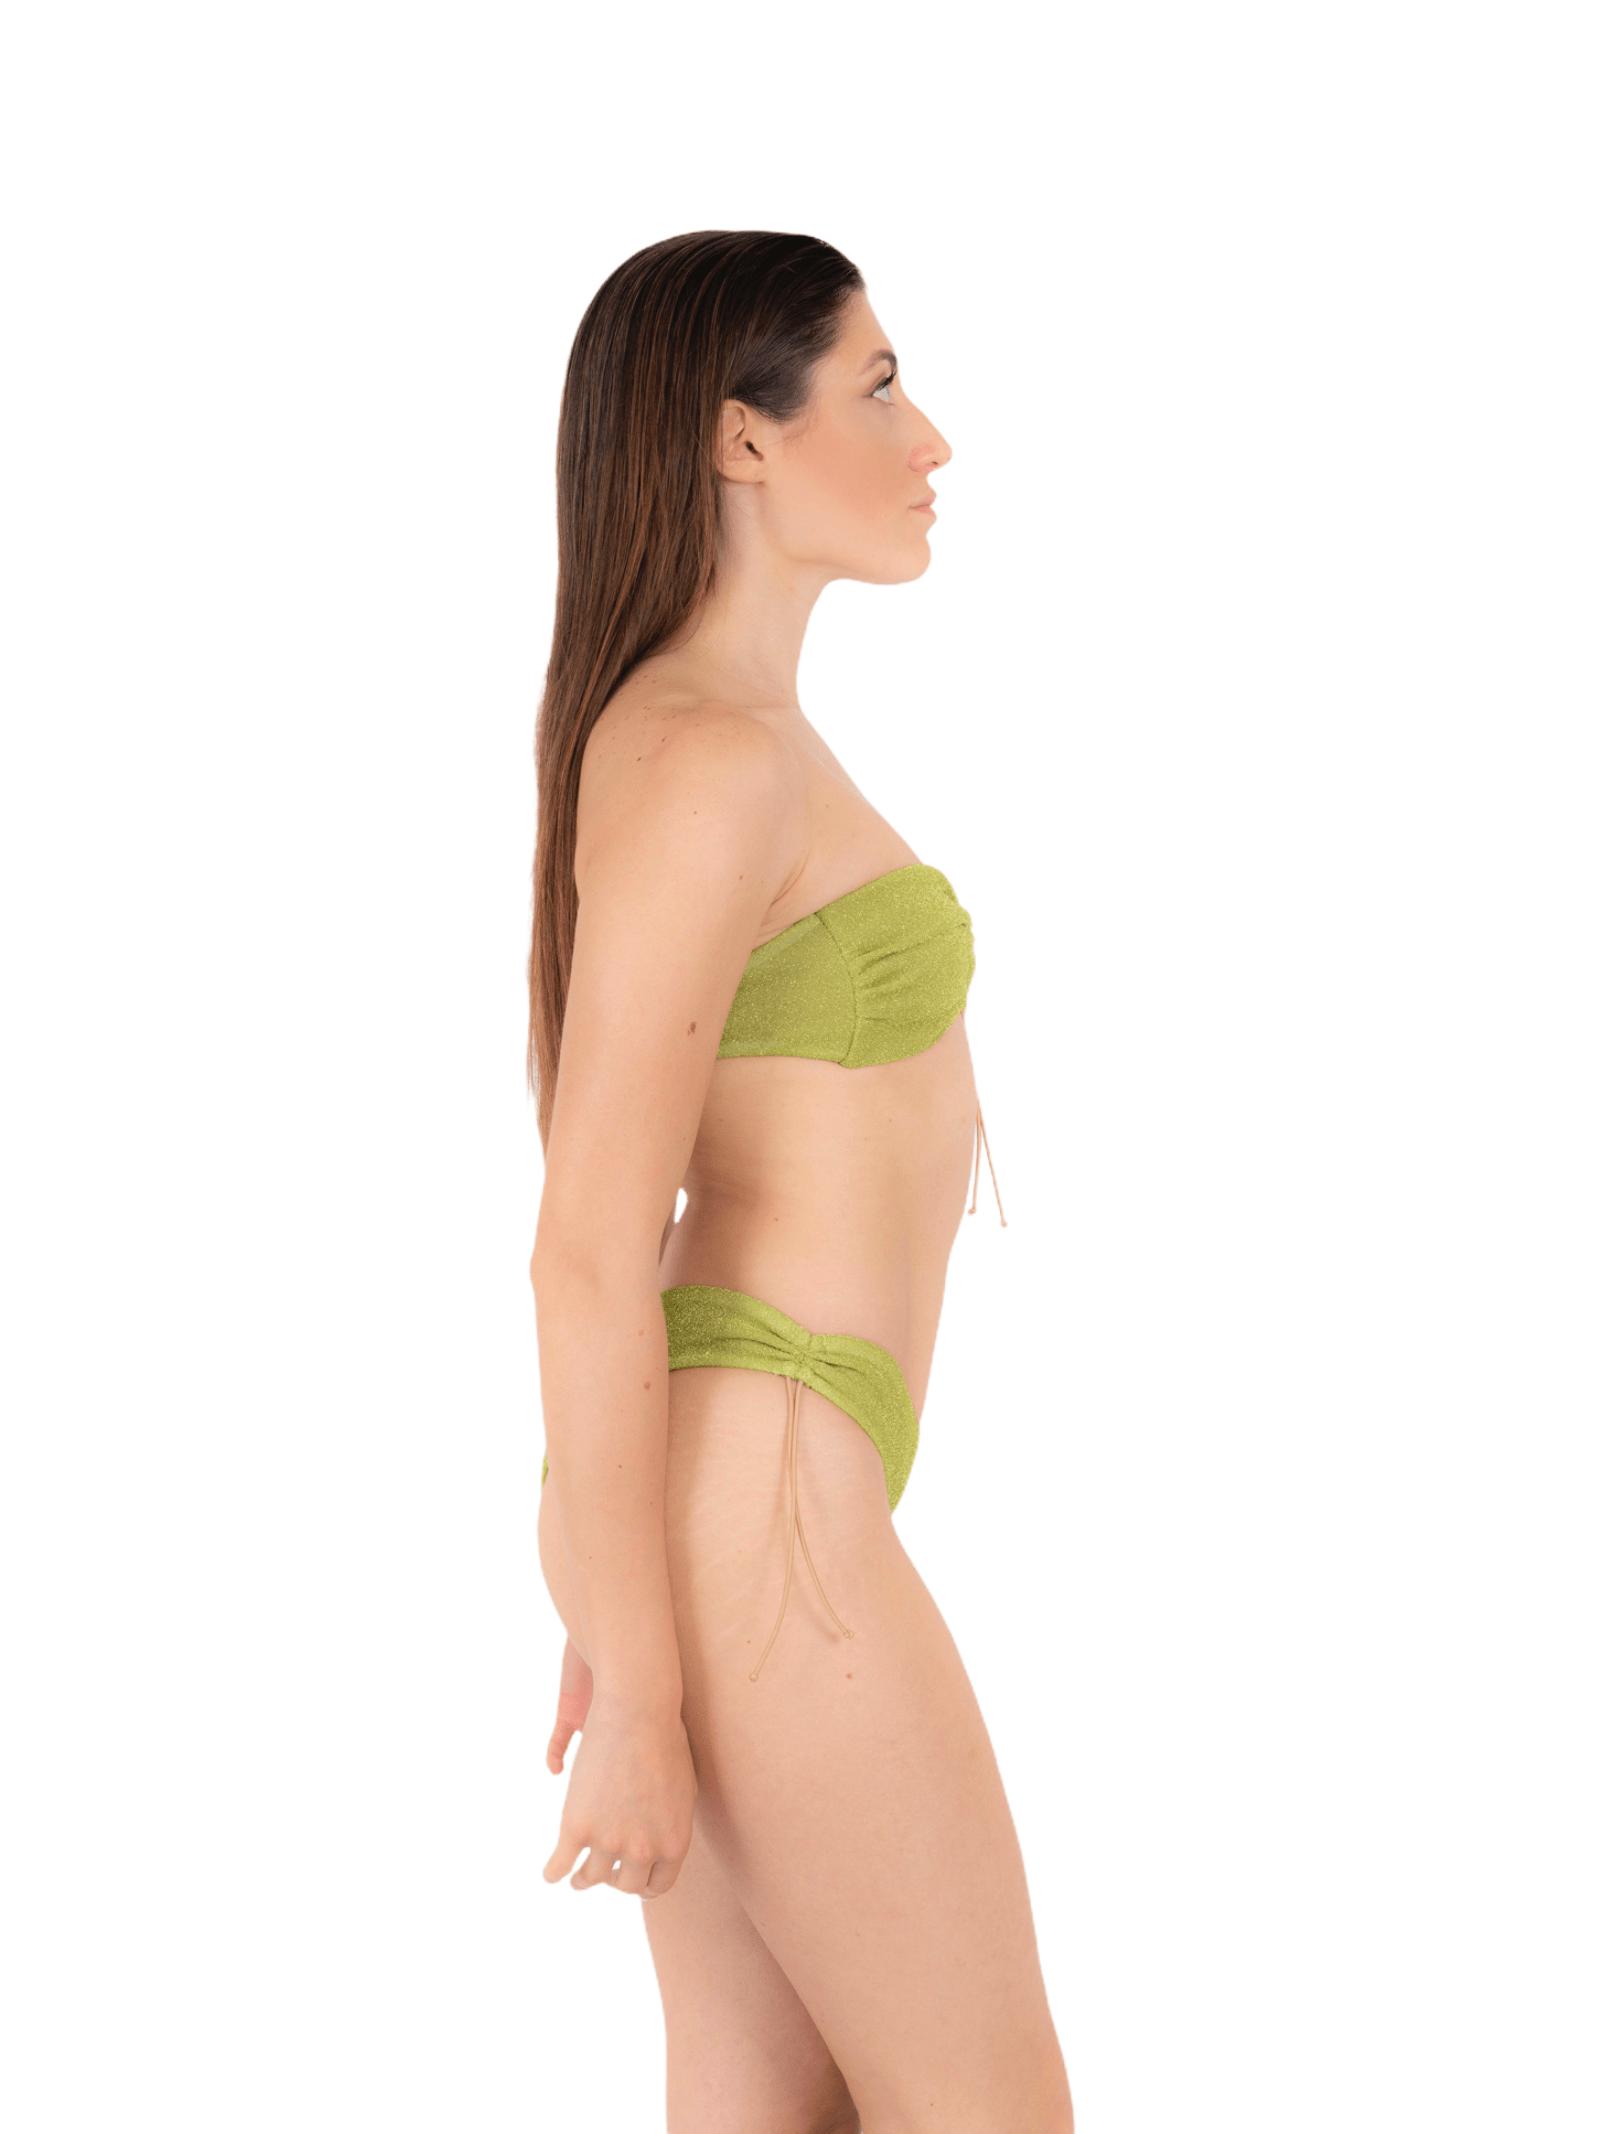 Bikini top with drawstring slip ANNAMARE | 23 | BK-114VERDE